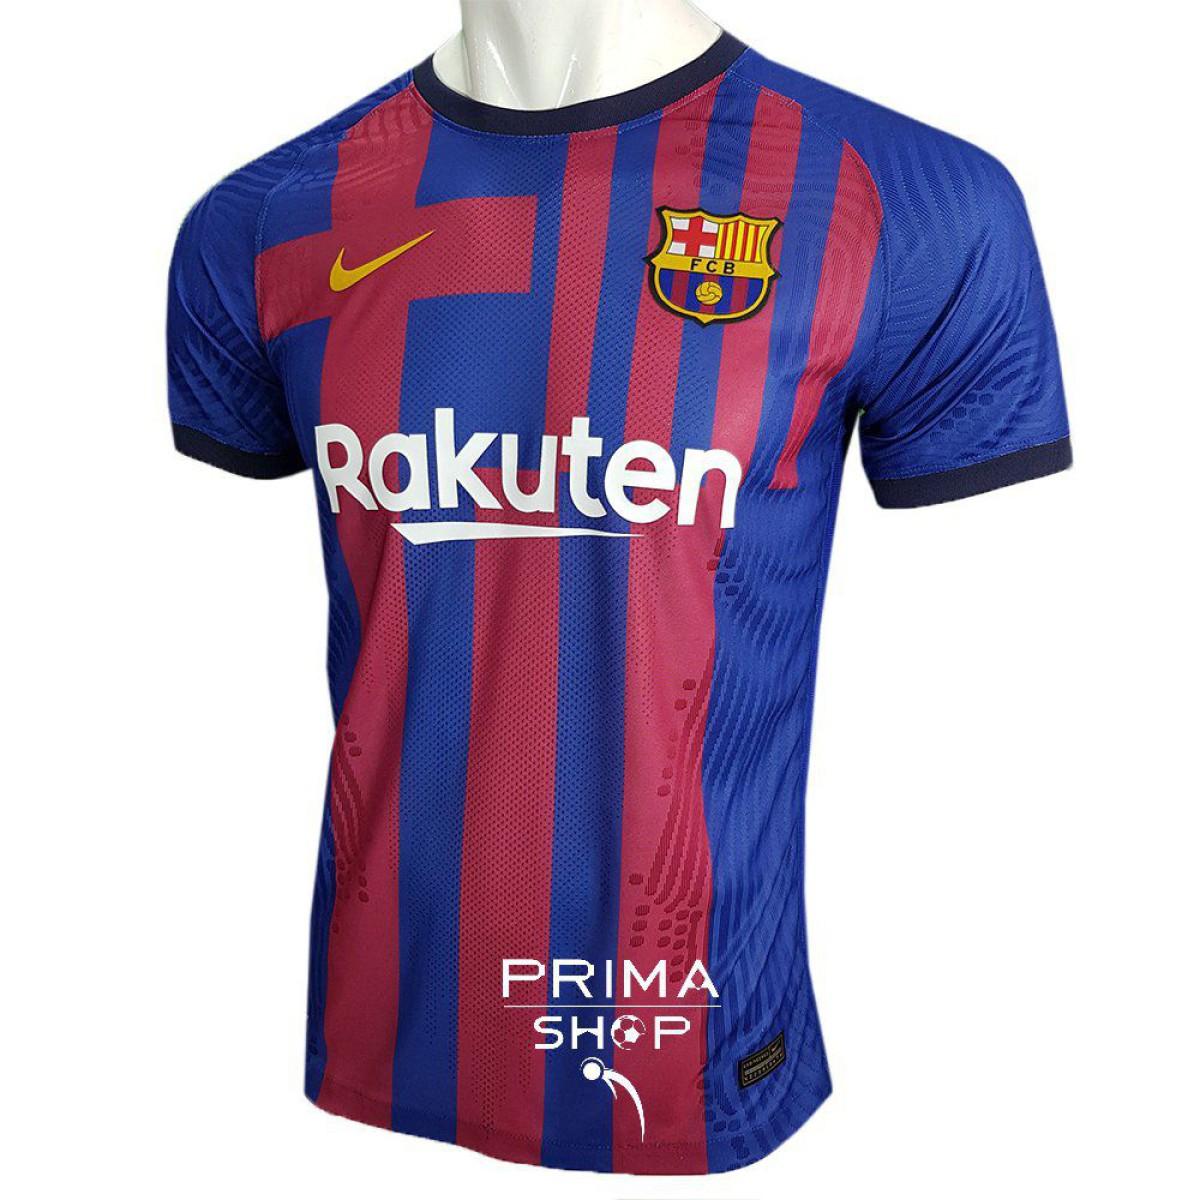 لباس پلیری بارسلونا 2022 احتمالی